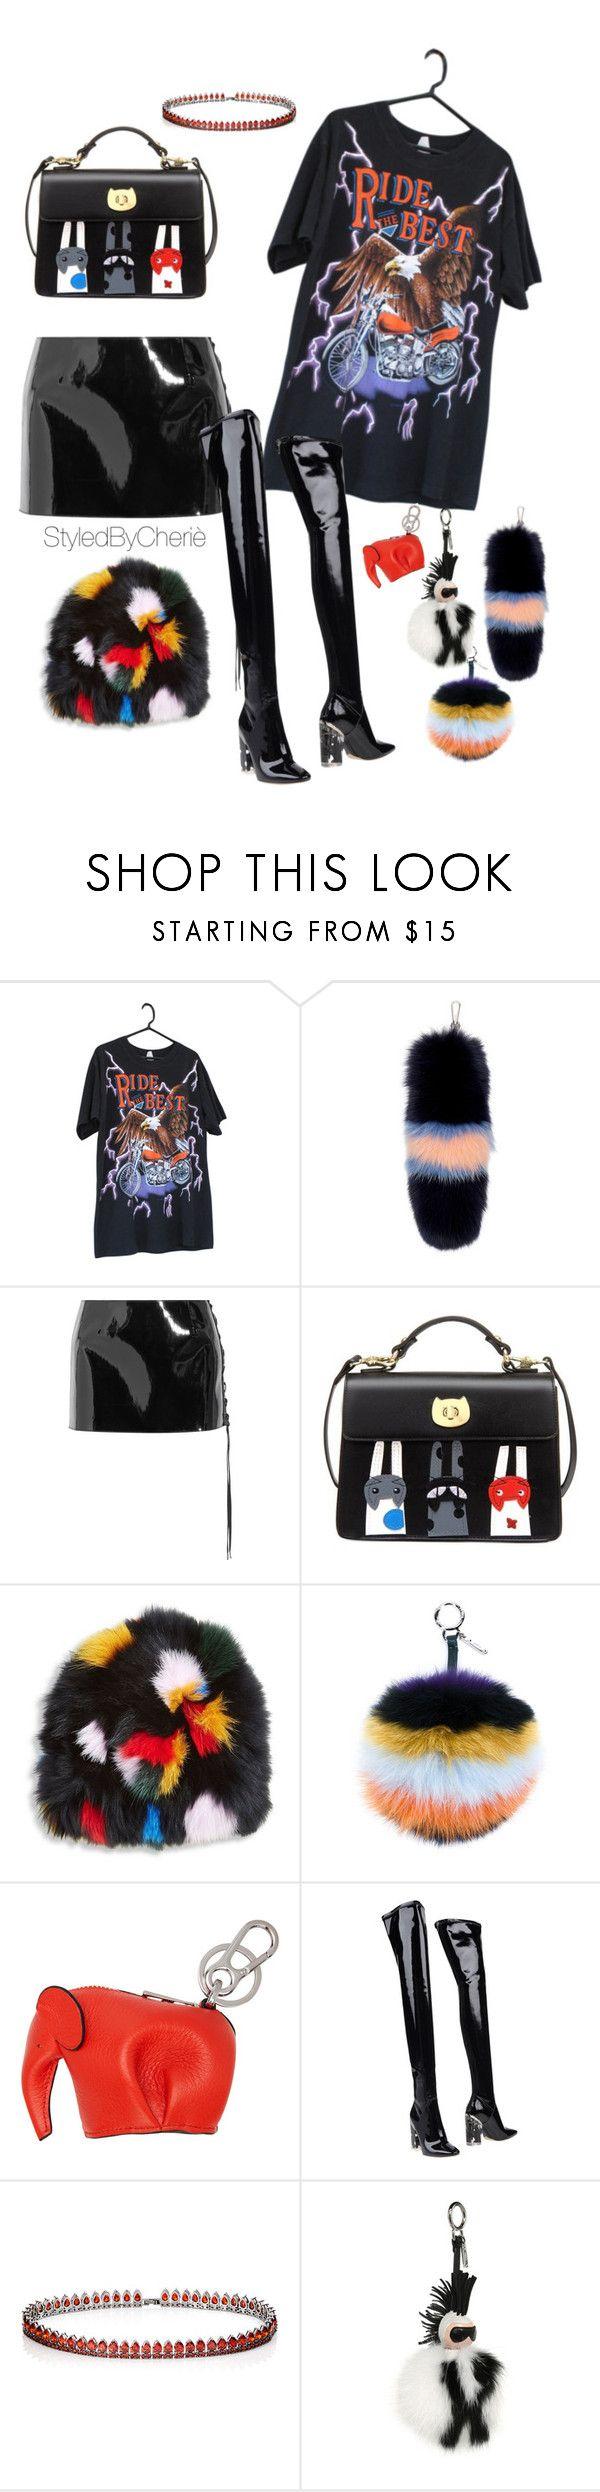 """Slick"" by masonsjar ❤ liked on Polyvore featuring Versace, Anthony Vaccarello, Loeffler Randall, Fendi, Loewe, Christian Dior and Fallon"